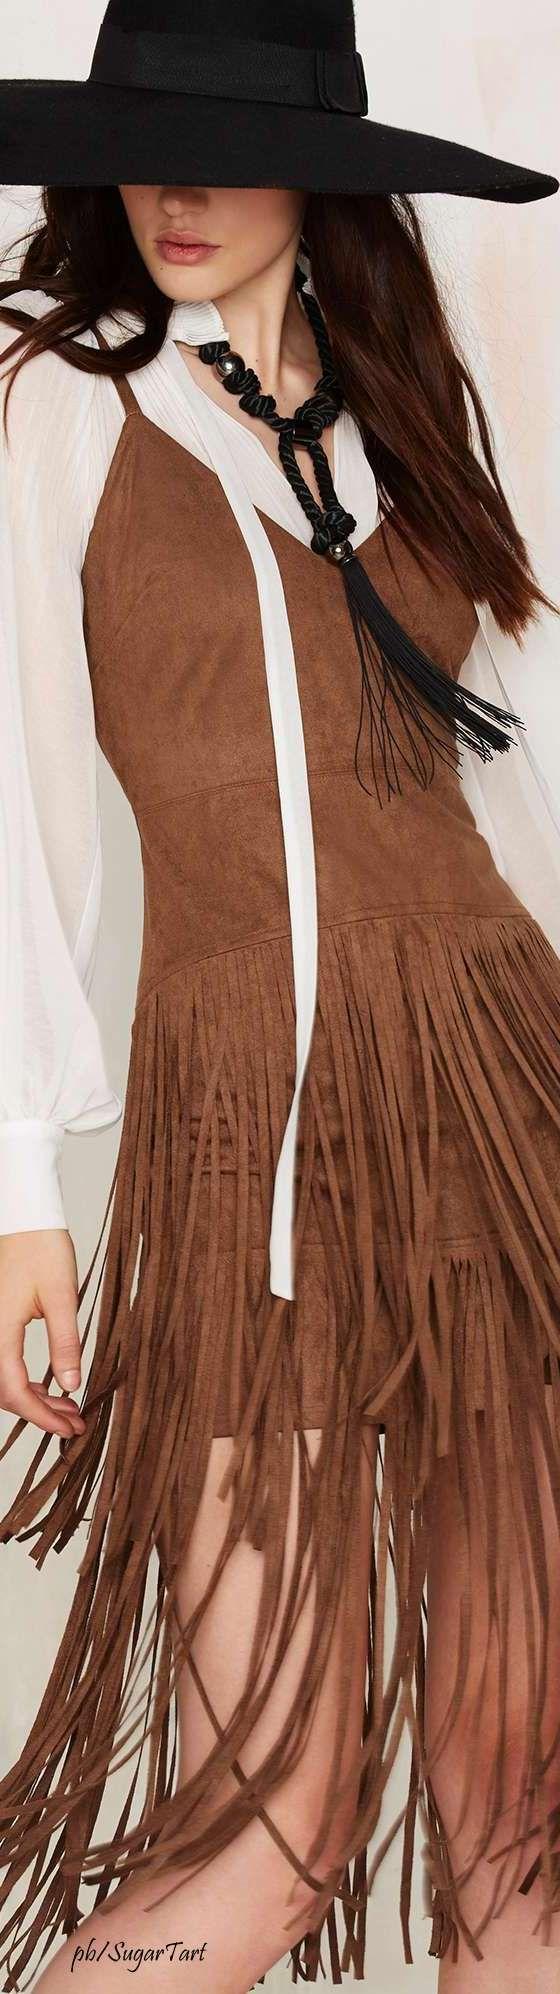 Fringed leather vest ≫∙∙☮ Bohème Babe ☮∙∙≪• ❤️ Babz ✿ιиѕριяαтισи❀ #abbigliamento #bohojewelry #boho